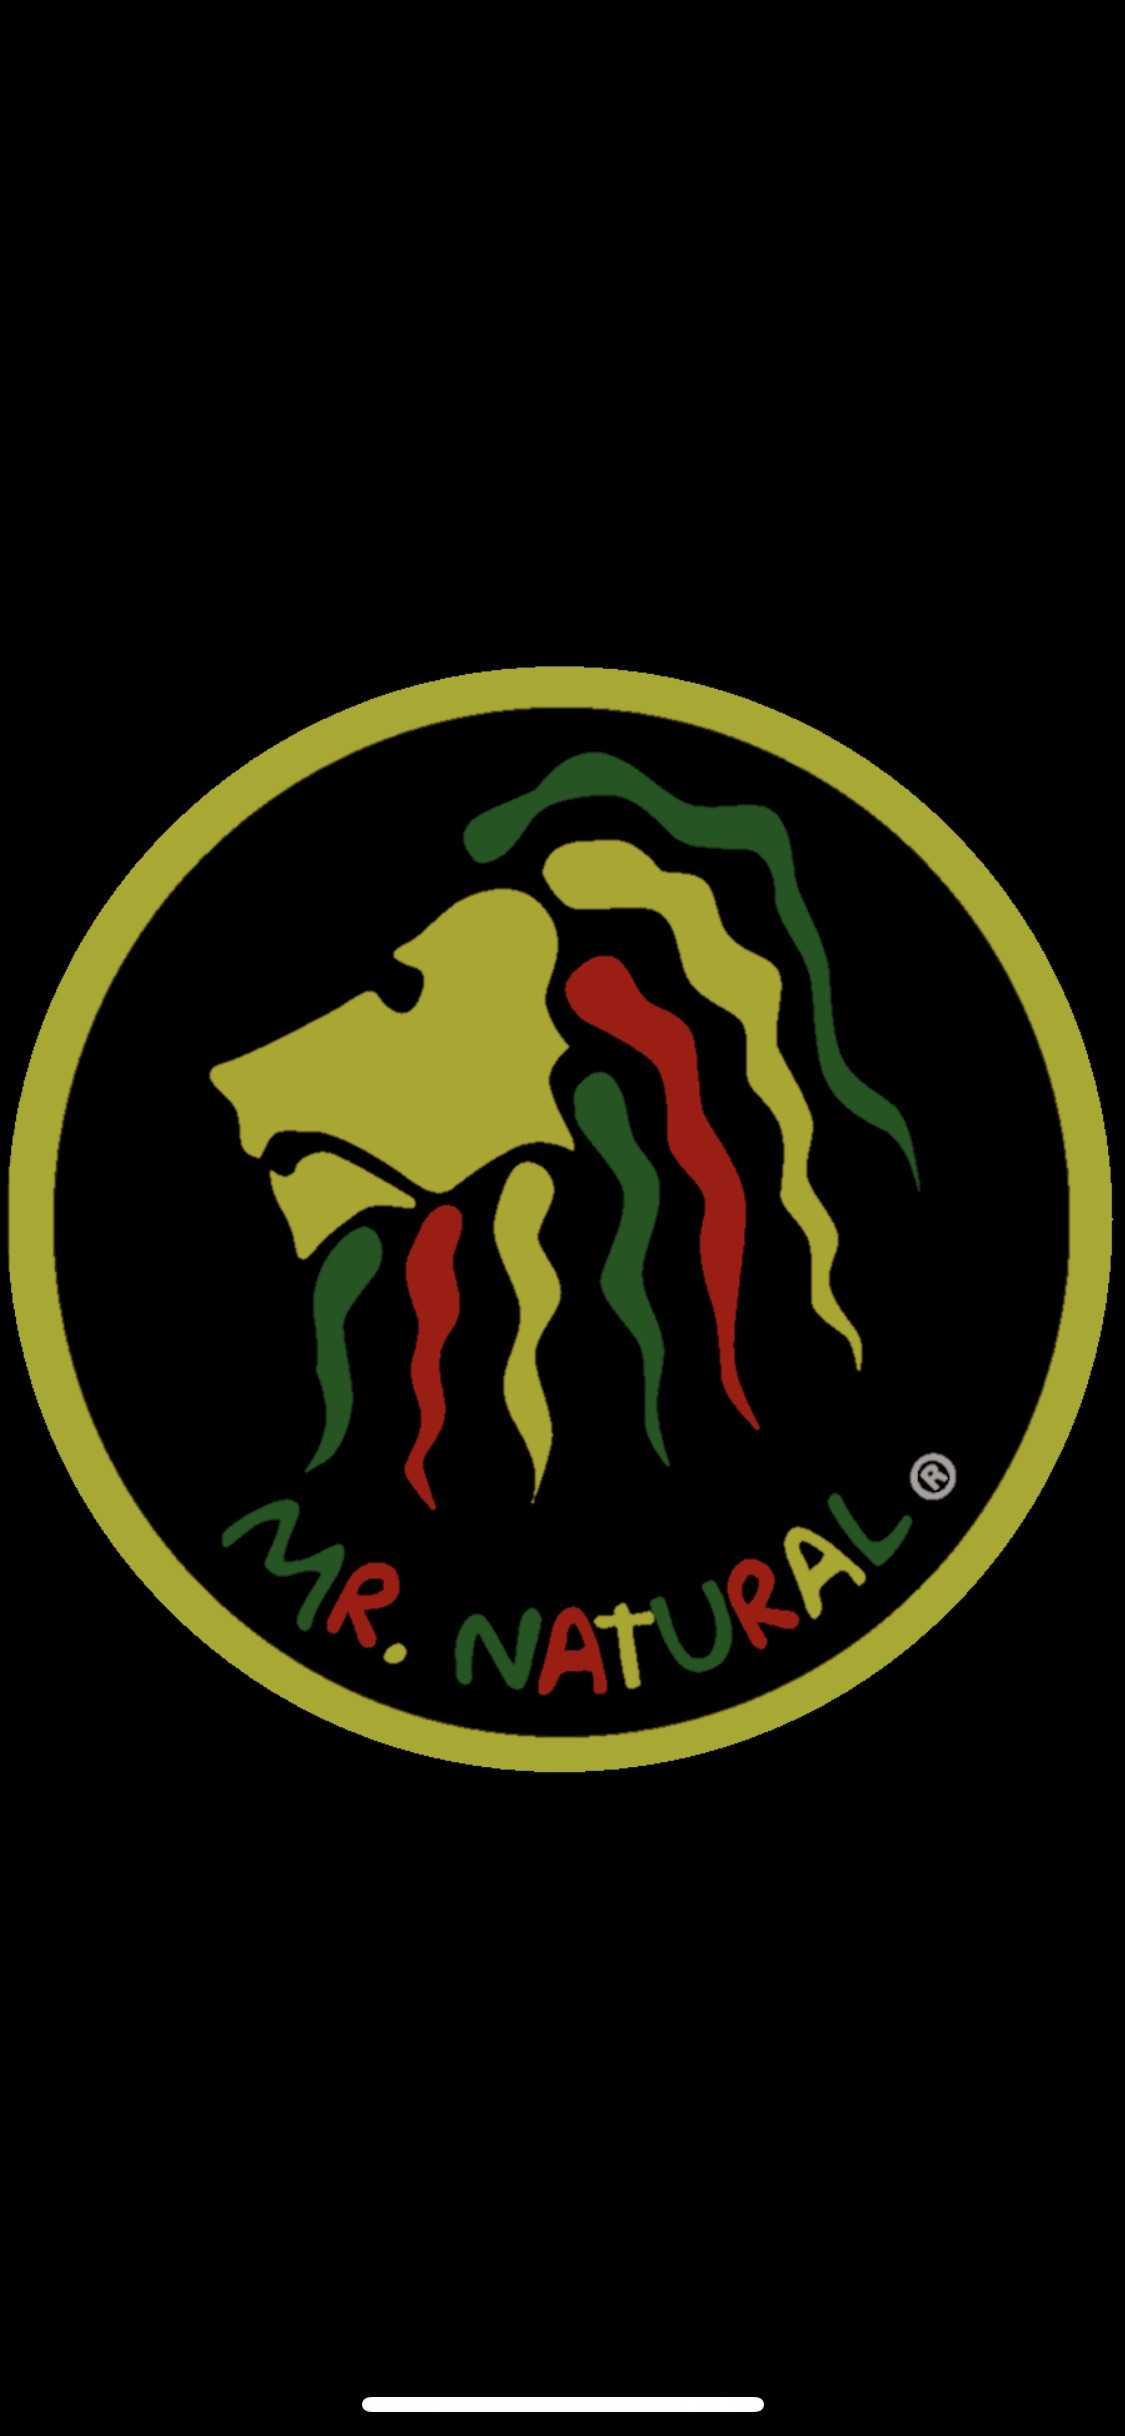 Bob Natural